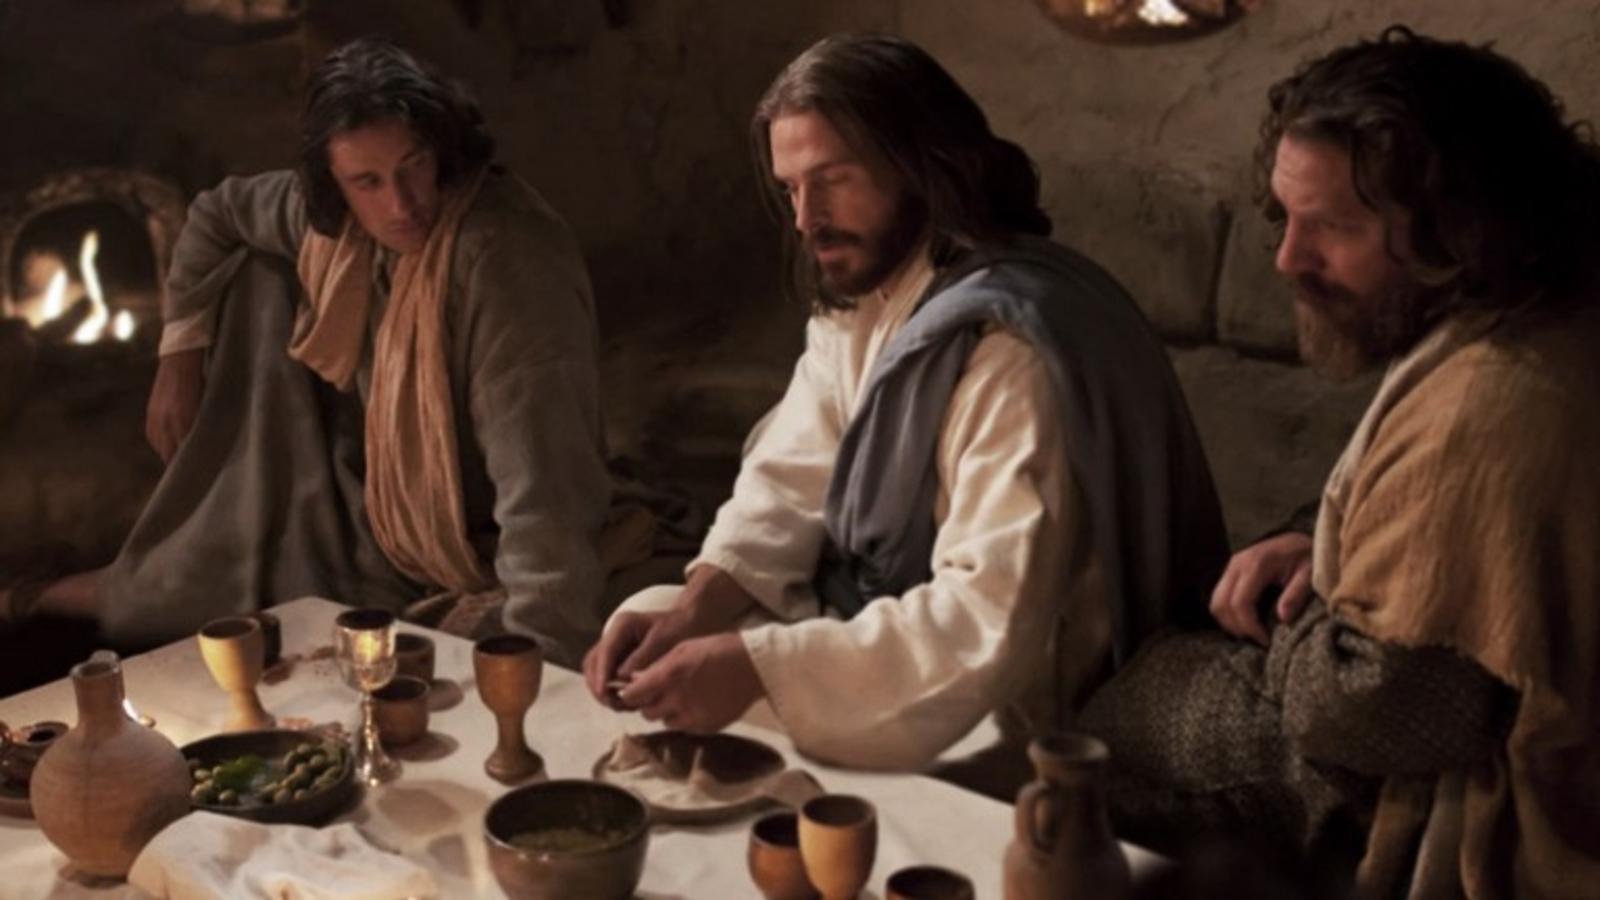 Jesus Last Supper Lds 1190756 Hd Wallpaper Backgrounds Download